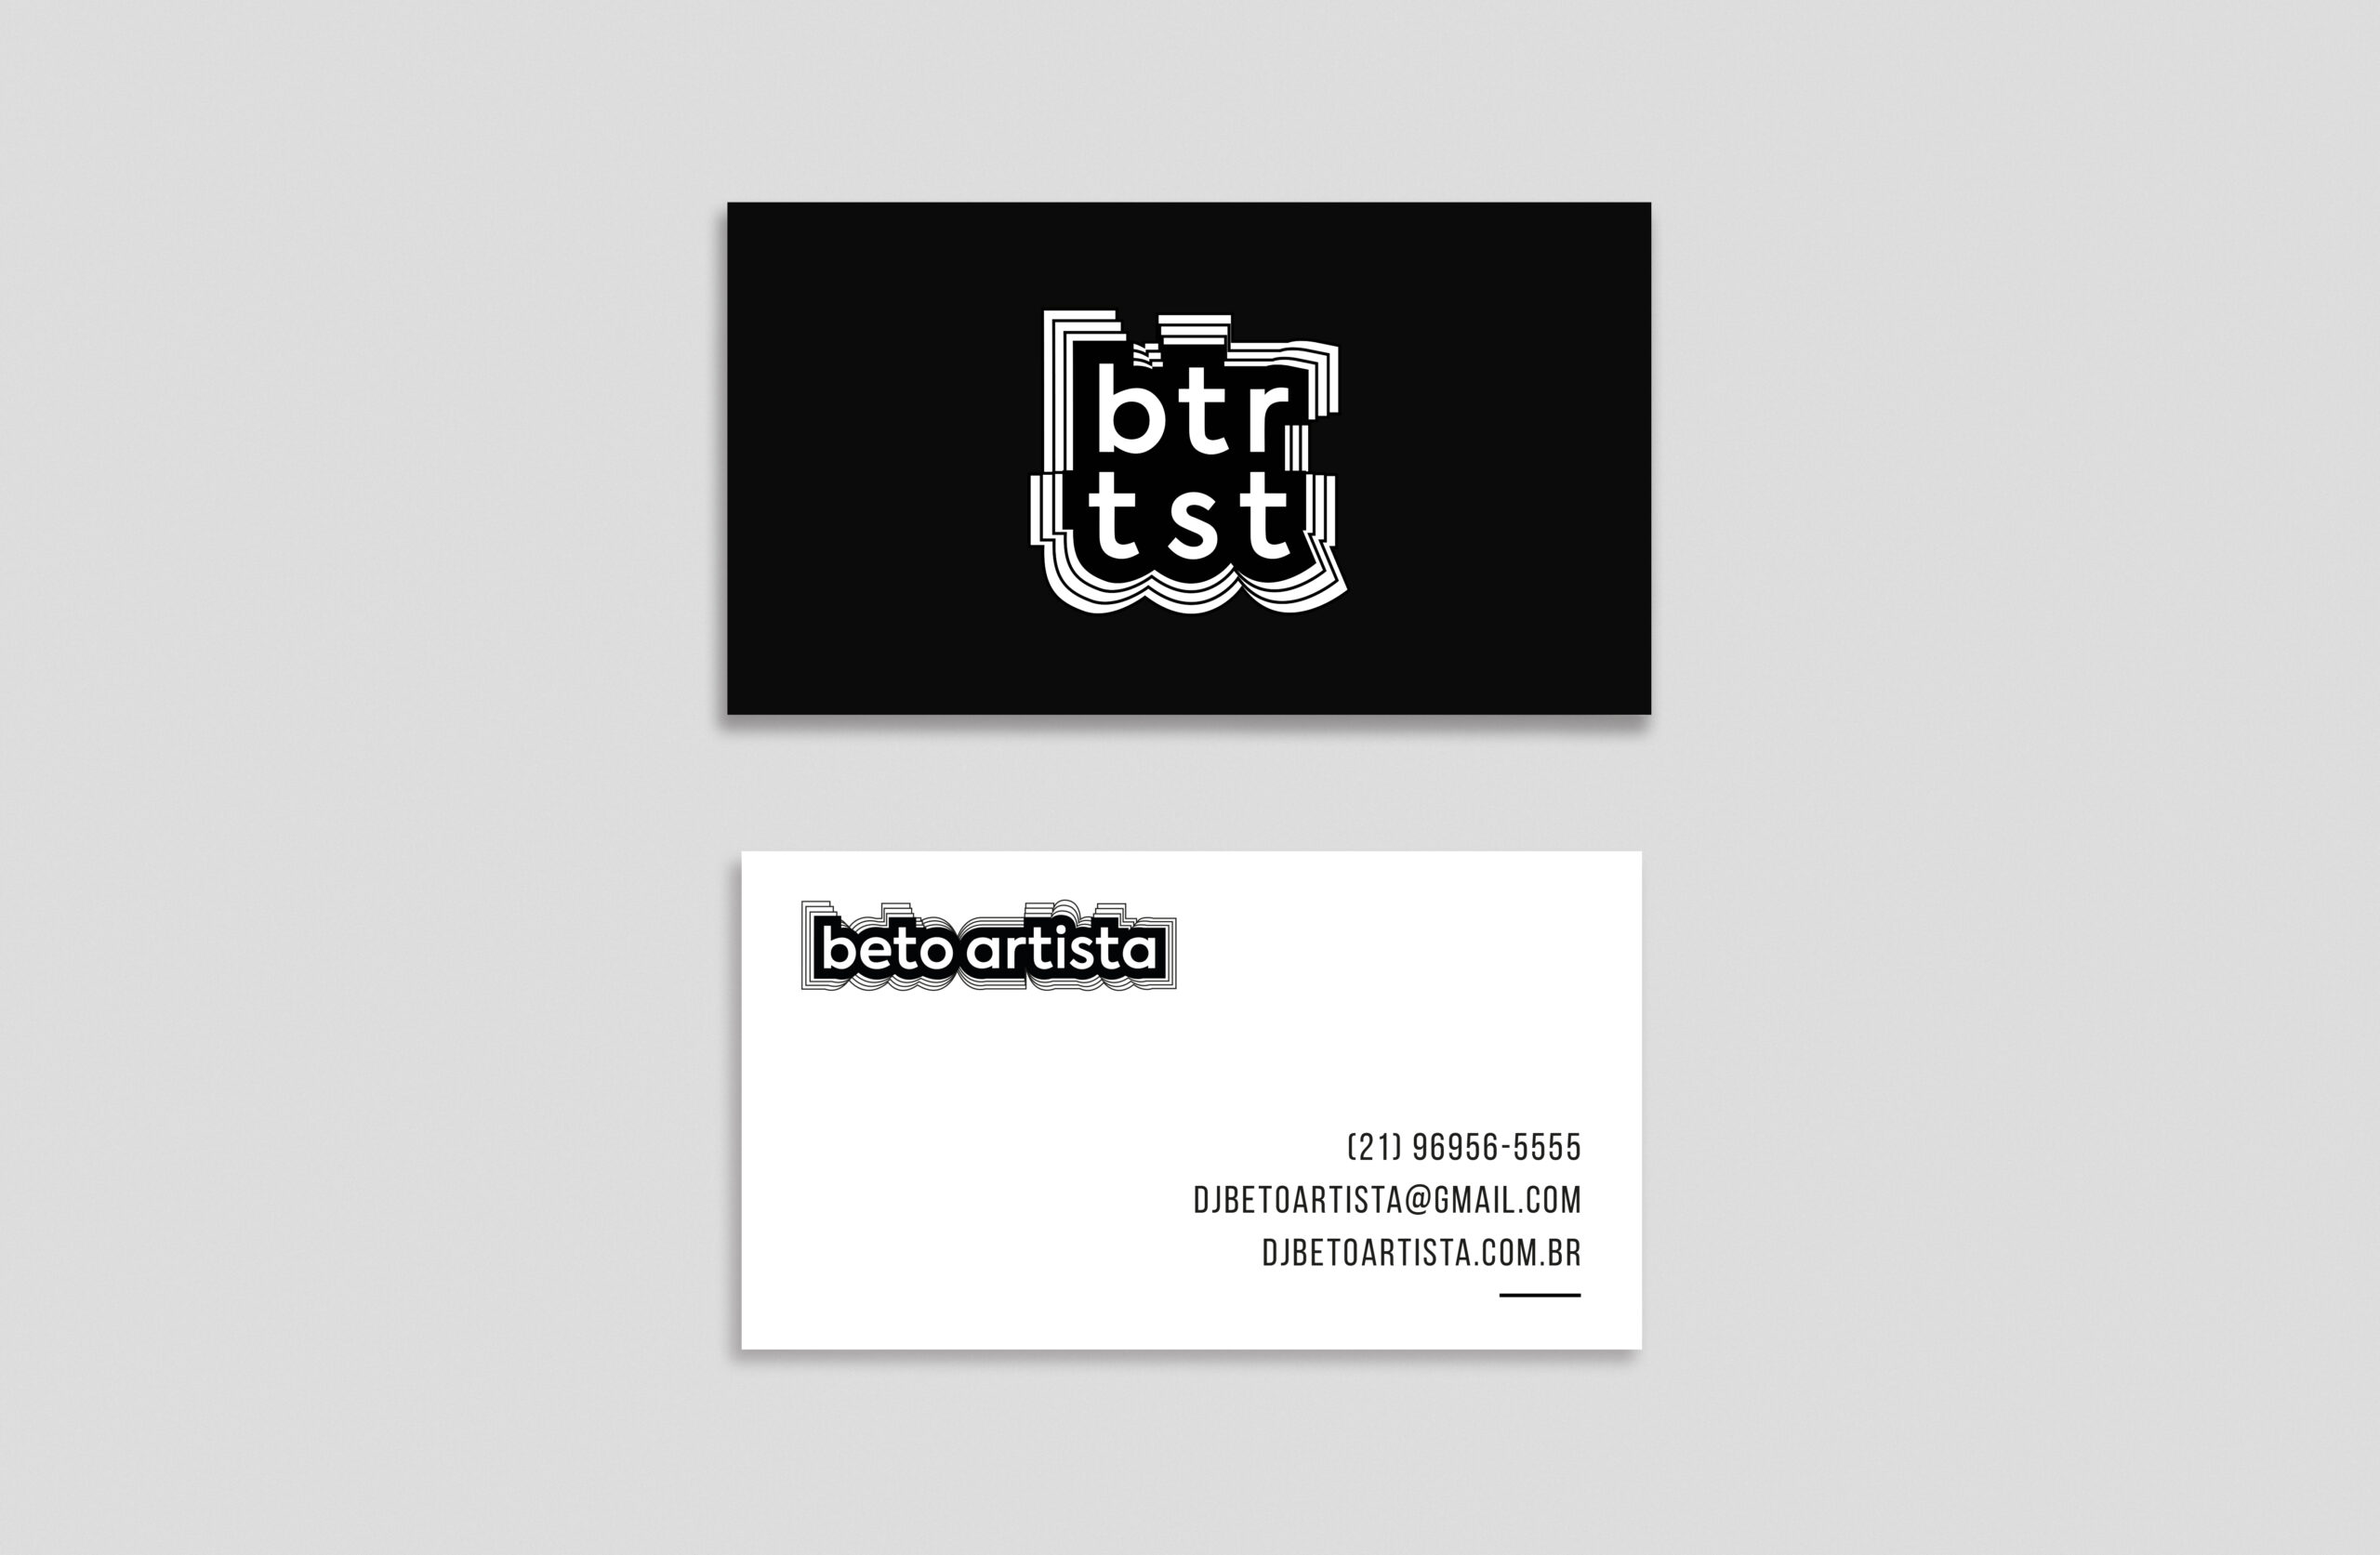 BetoArtista_04-scaled-1